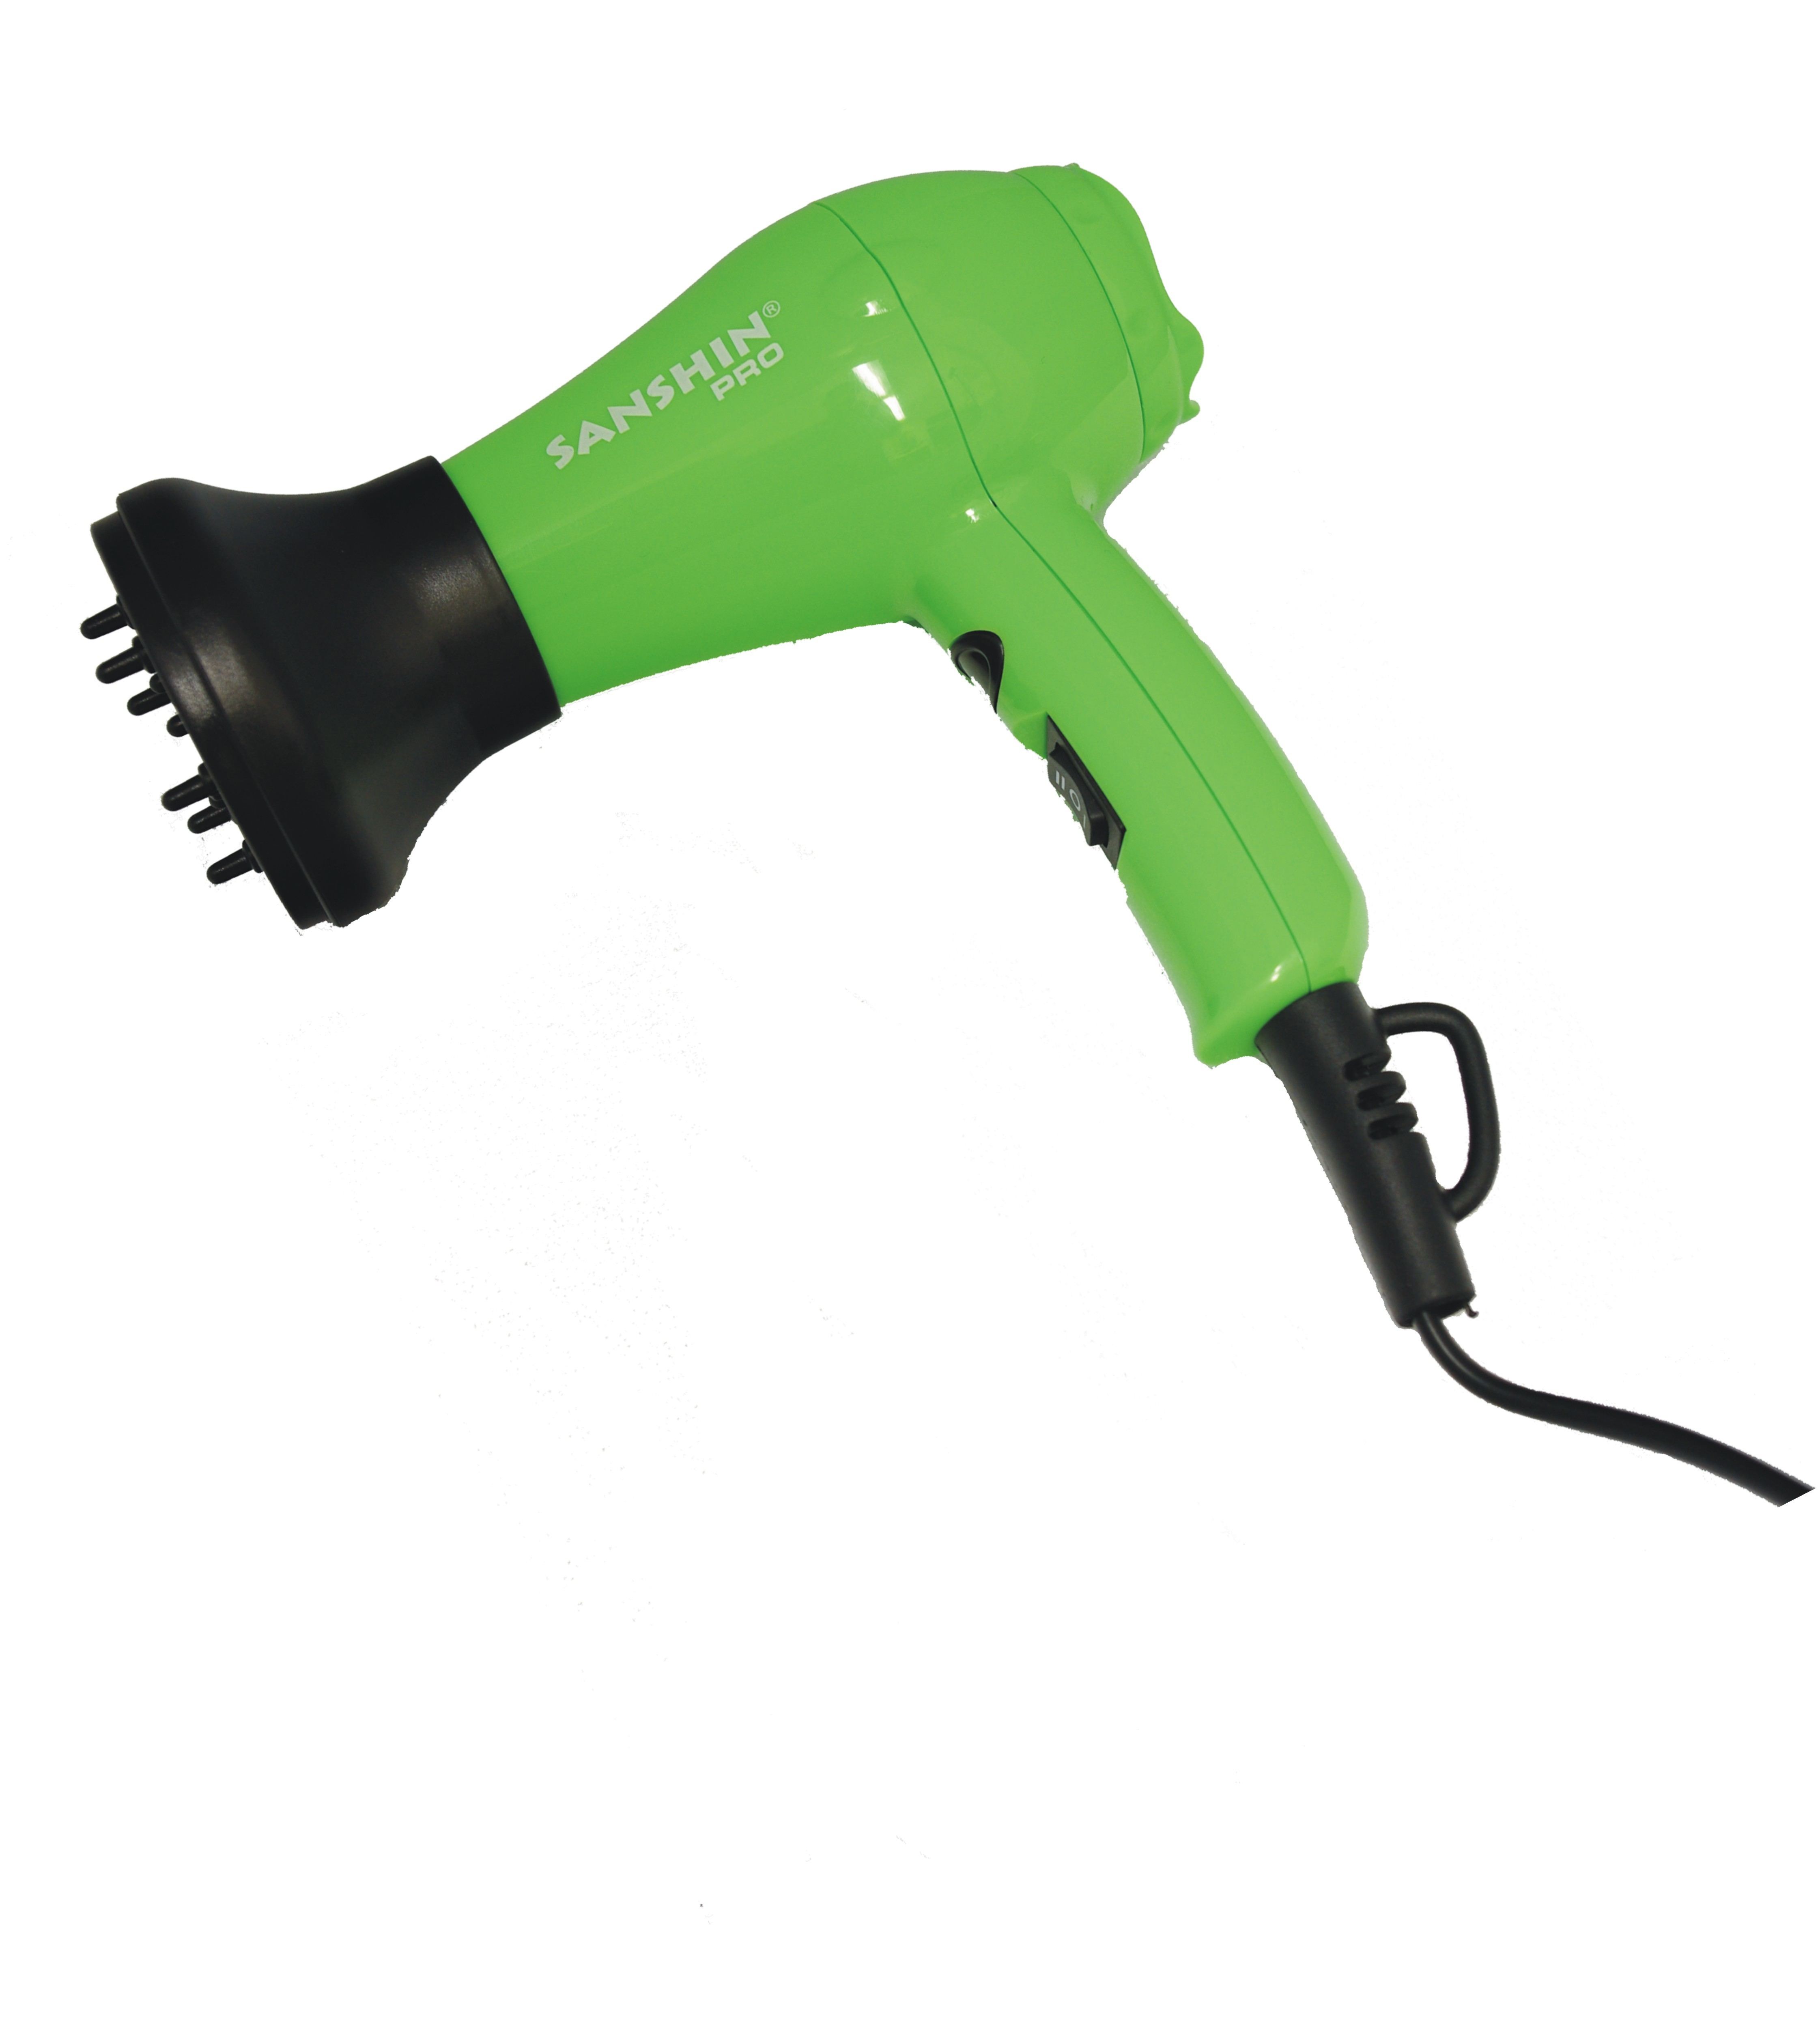 SANSHIN Mini-Haartrockner grün